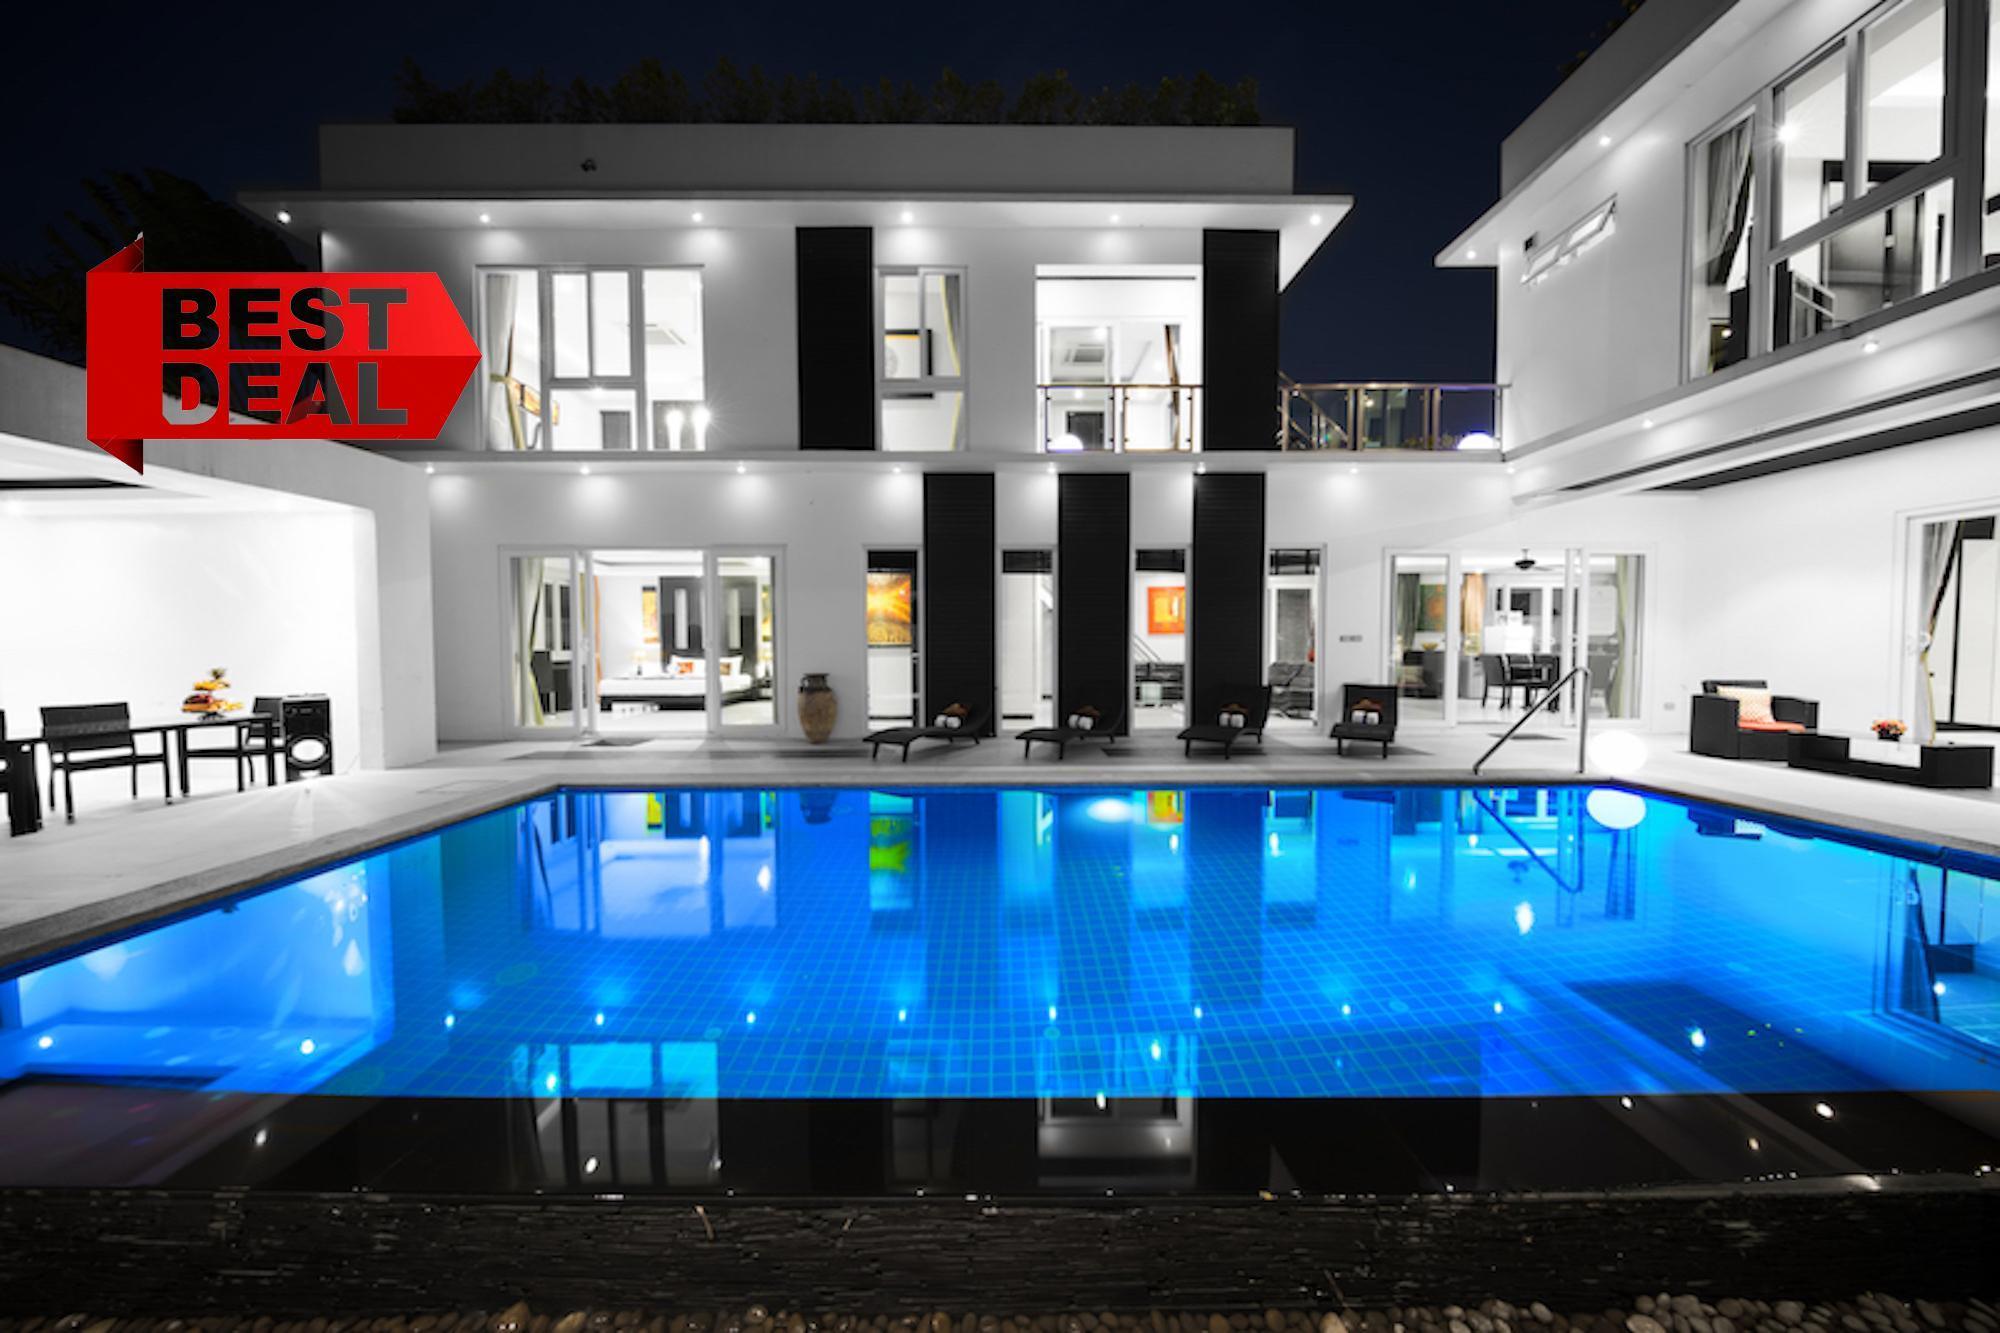 DIAMOND Pool Villa Pattaya With Jacuzzi And Sauna